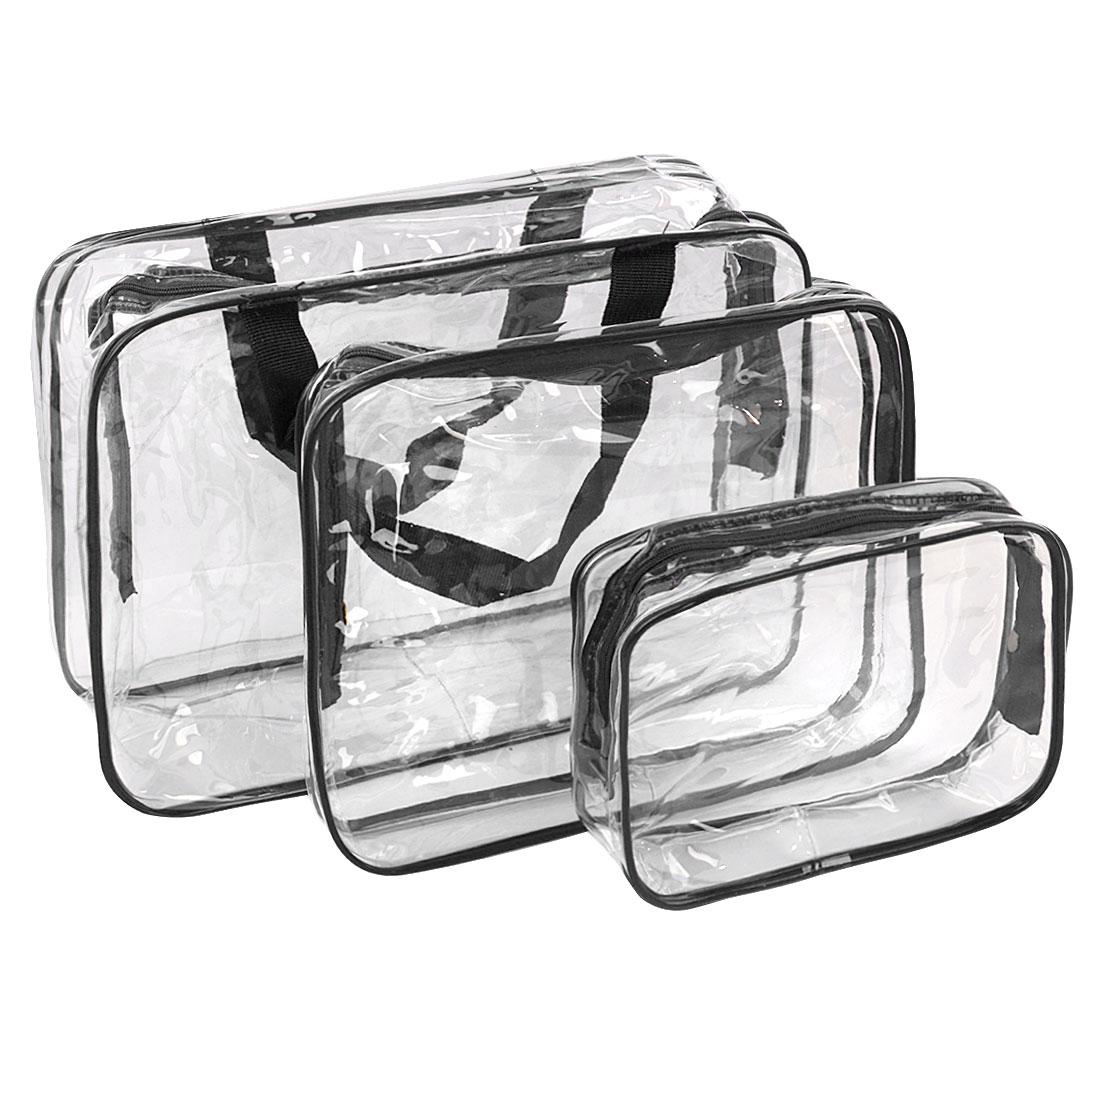 3 Pieces Travel PVC Cosmetic Bag Makeup Toiletry Wash Bag Holder Pouch Set Black